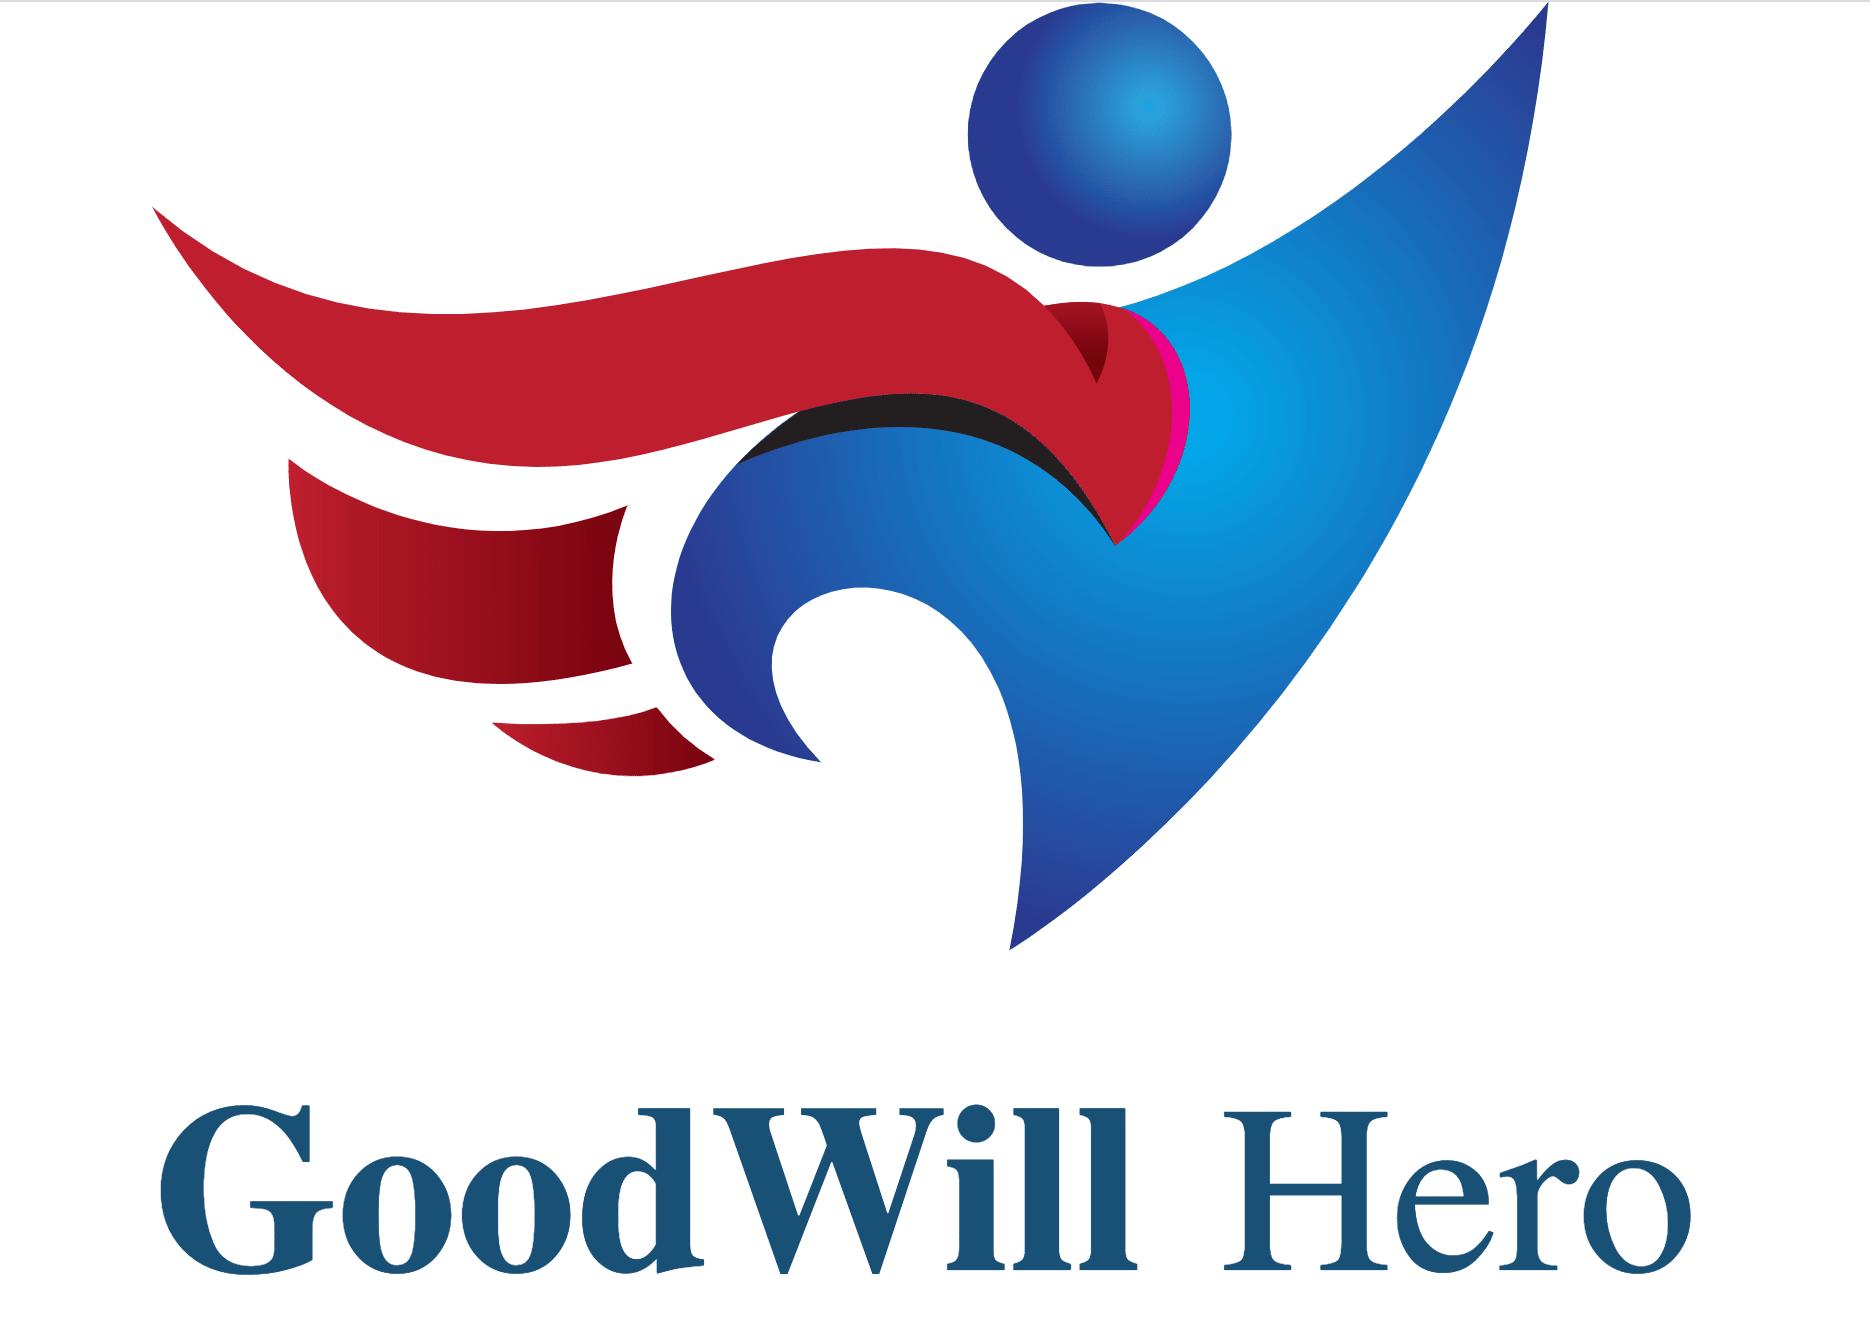 GoodWill Hero